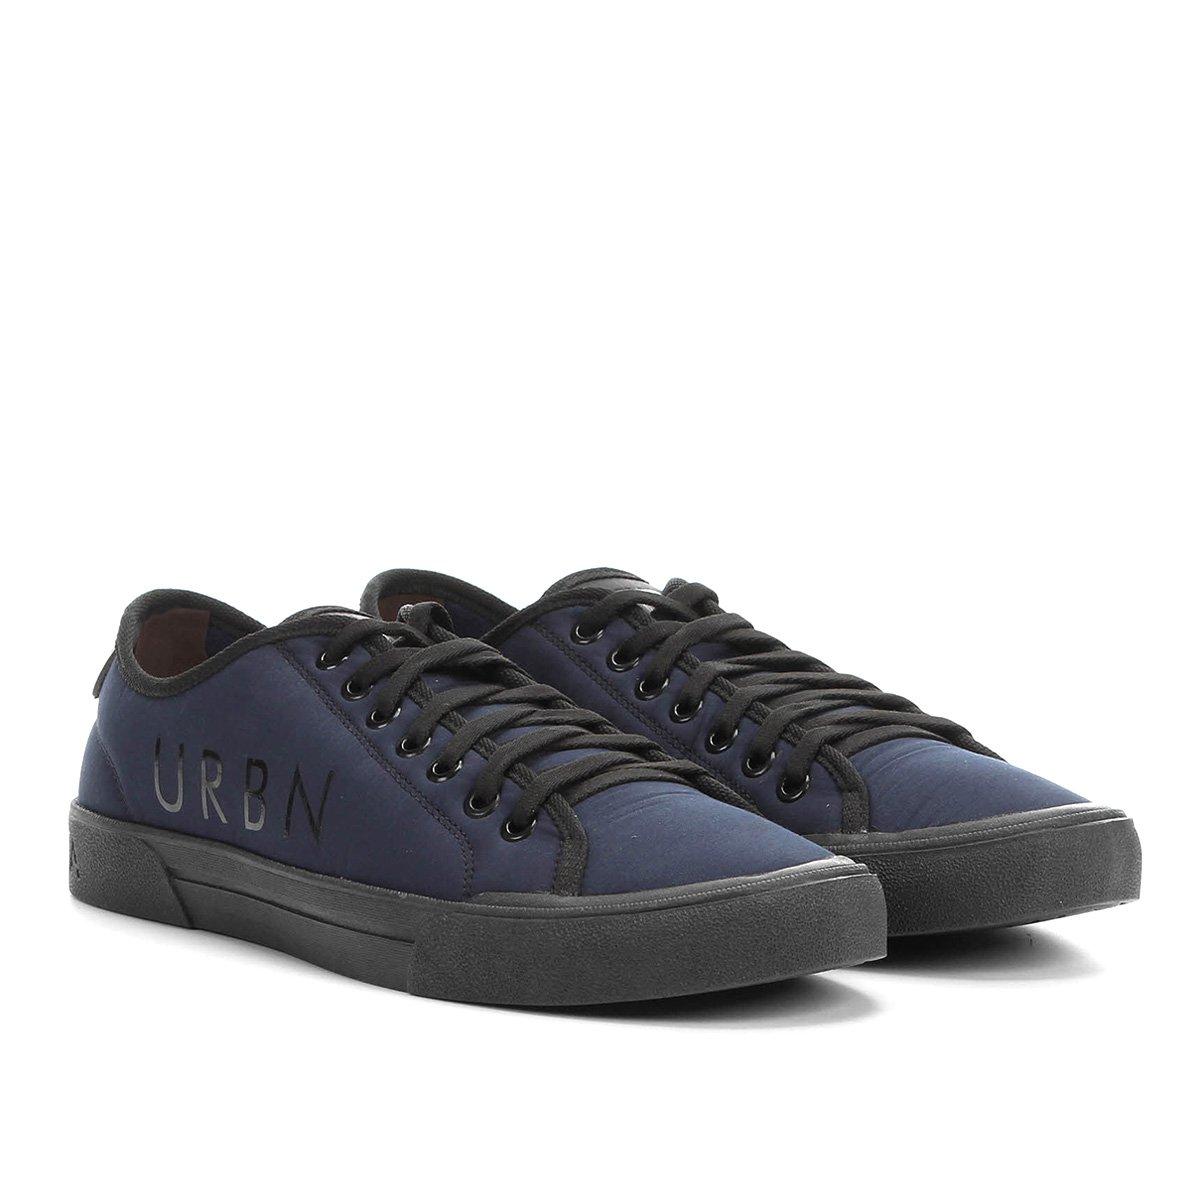 773087f5296 Tênis Democrata Básico Urban Beat Masculino - Azul e Preto - Compre Agora